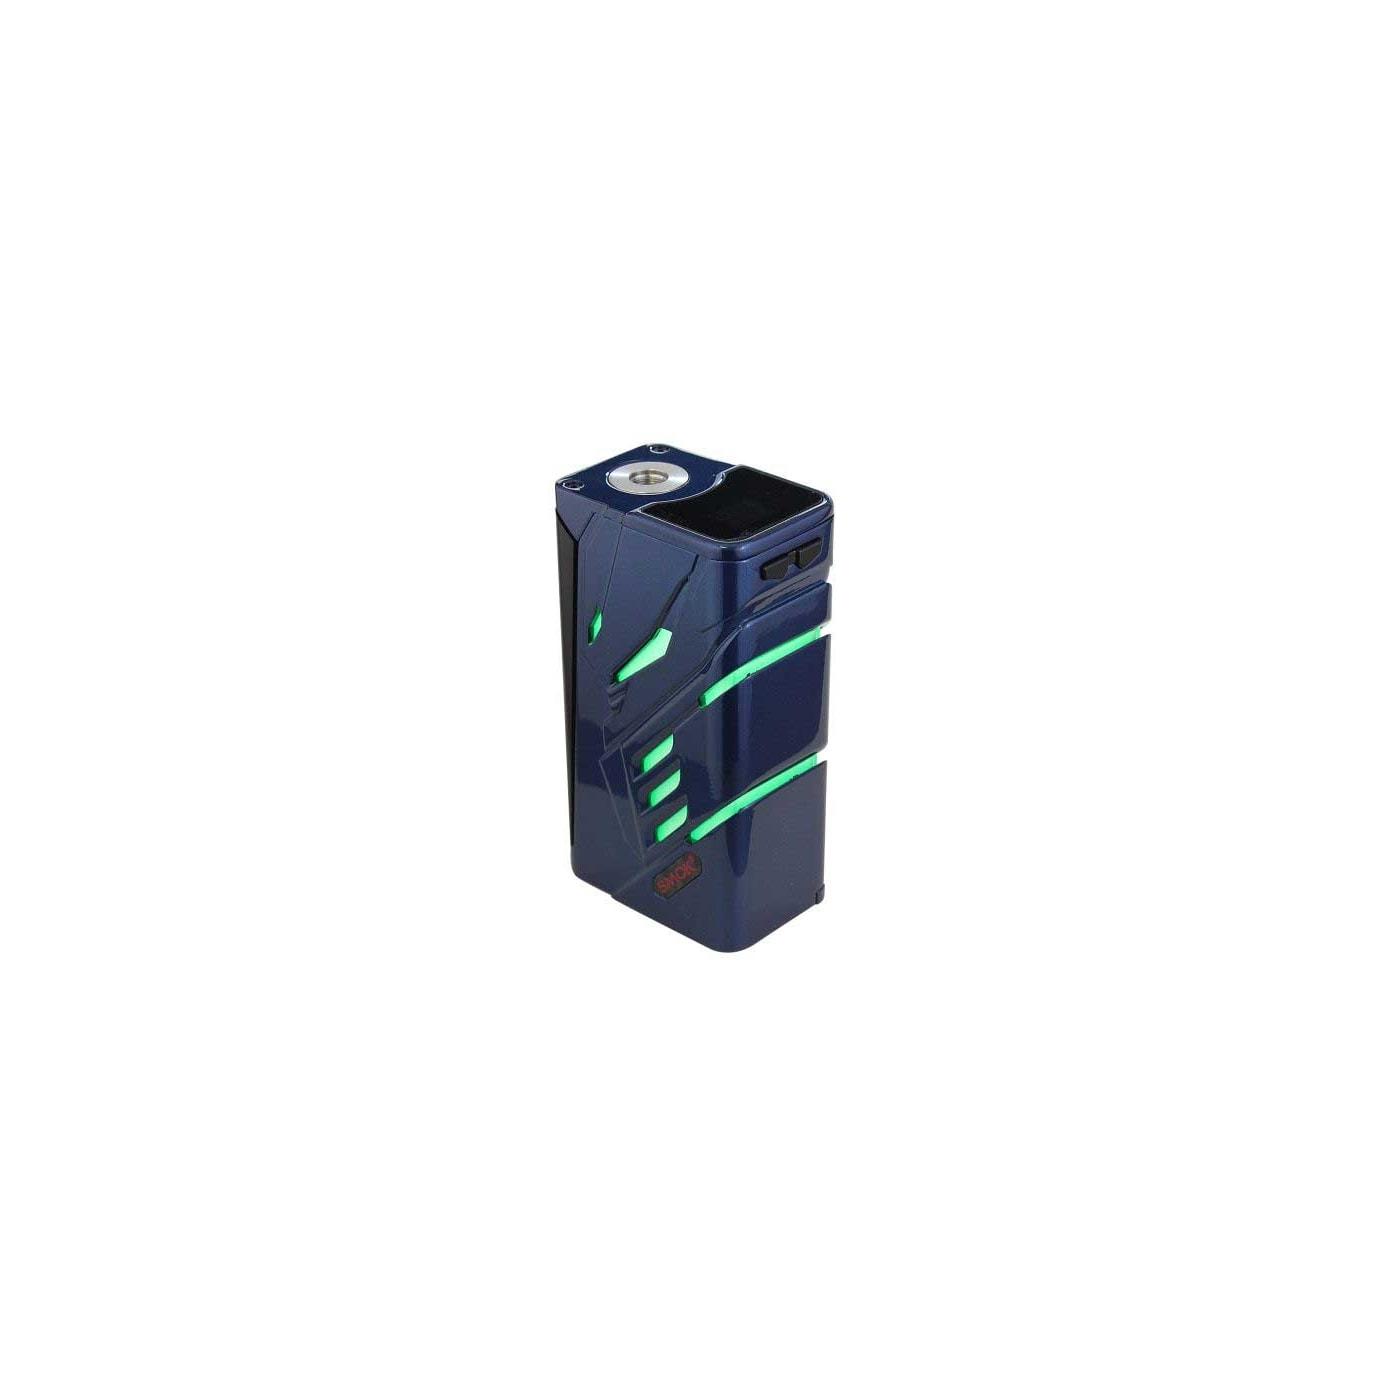 Smok T-Priv Box Mod